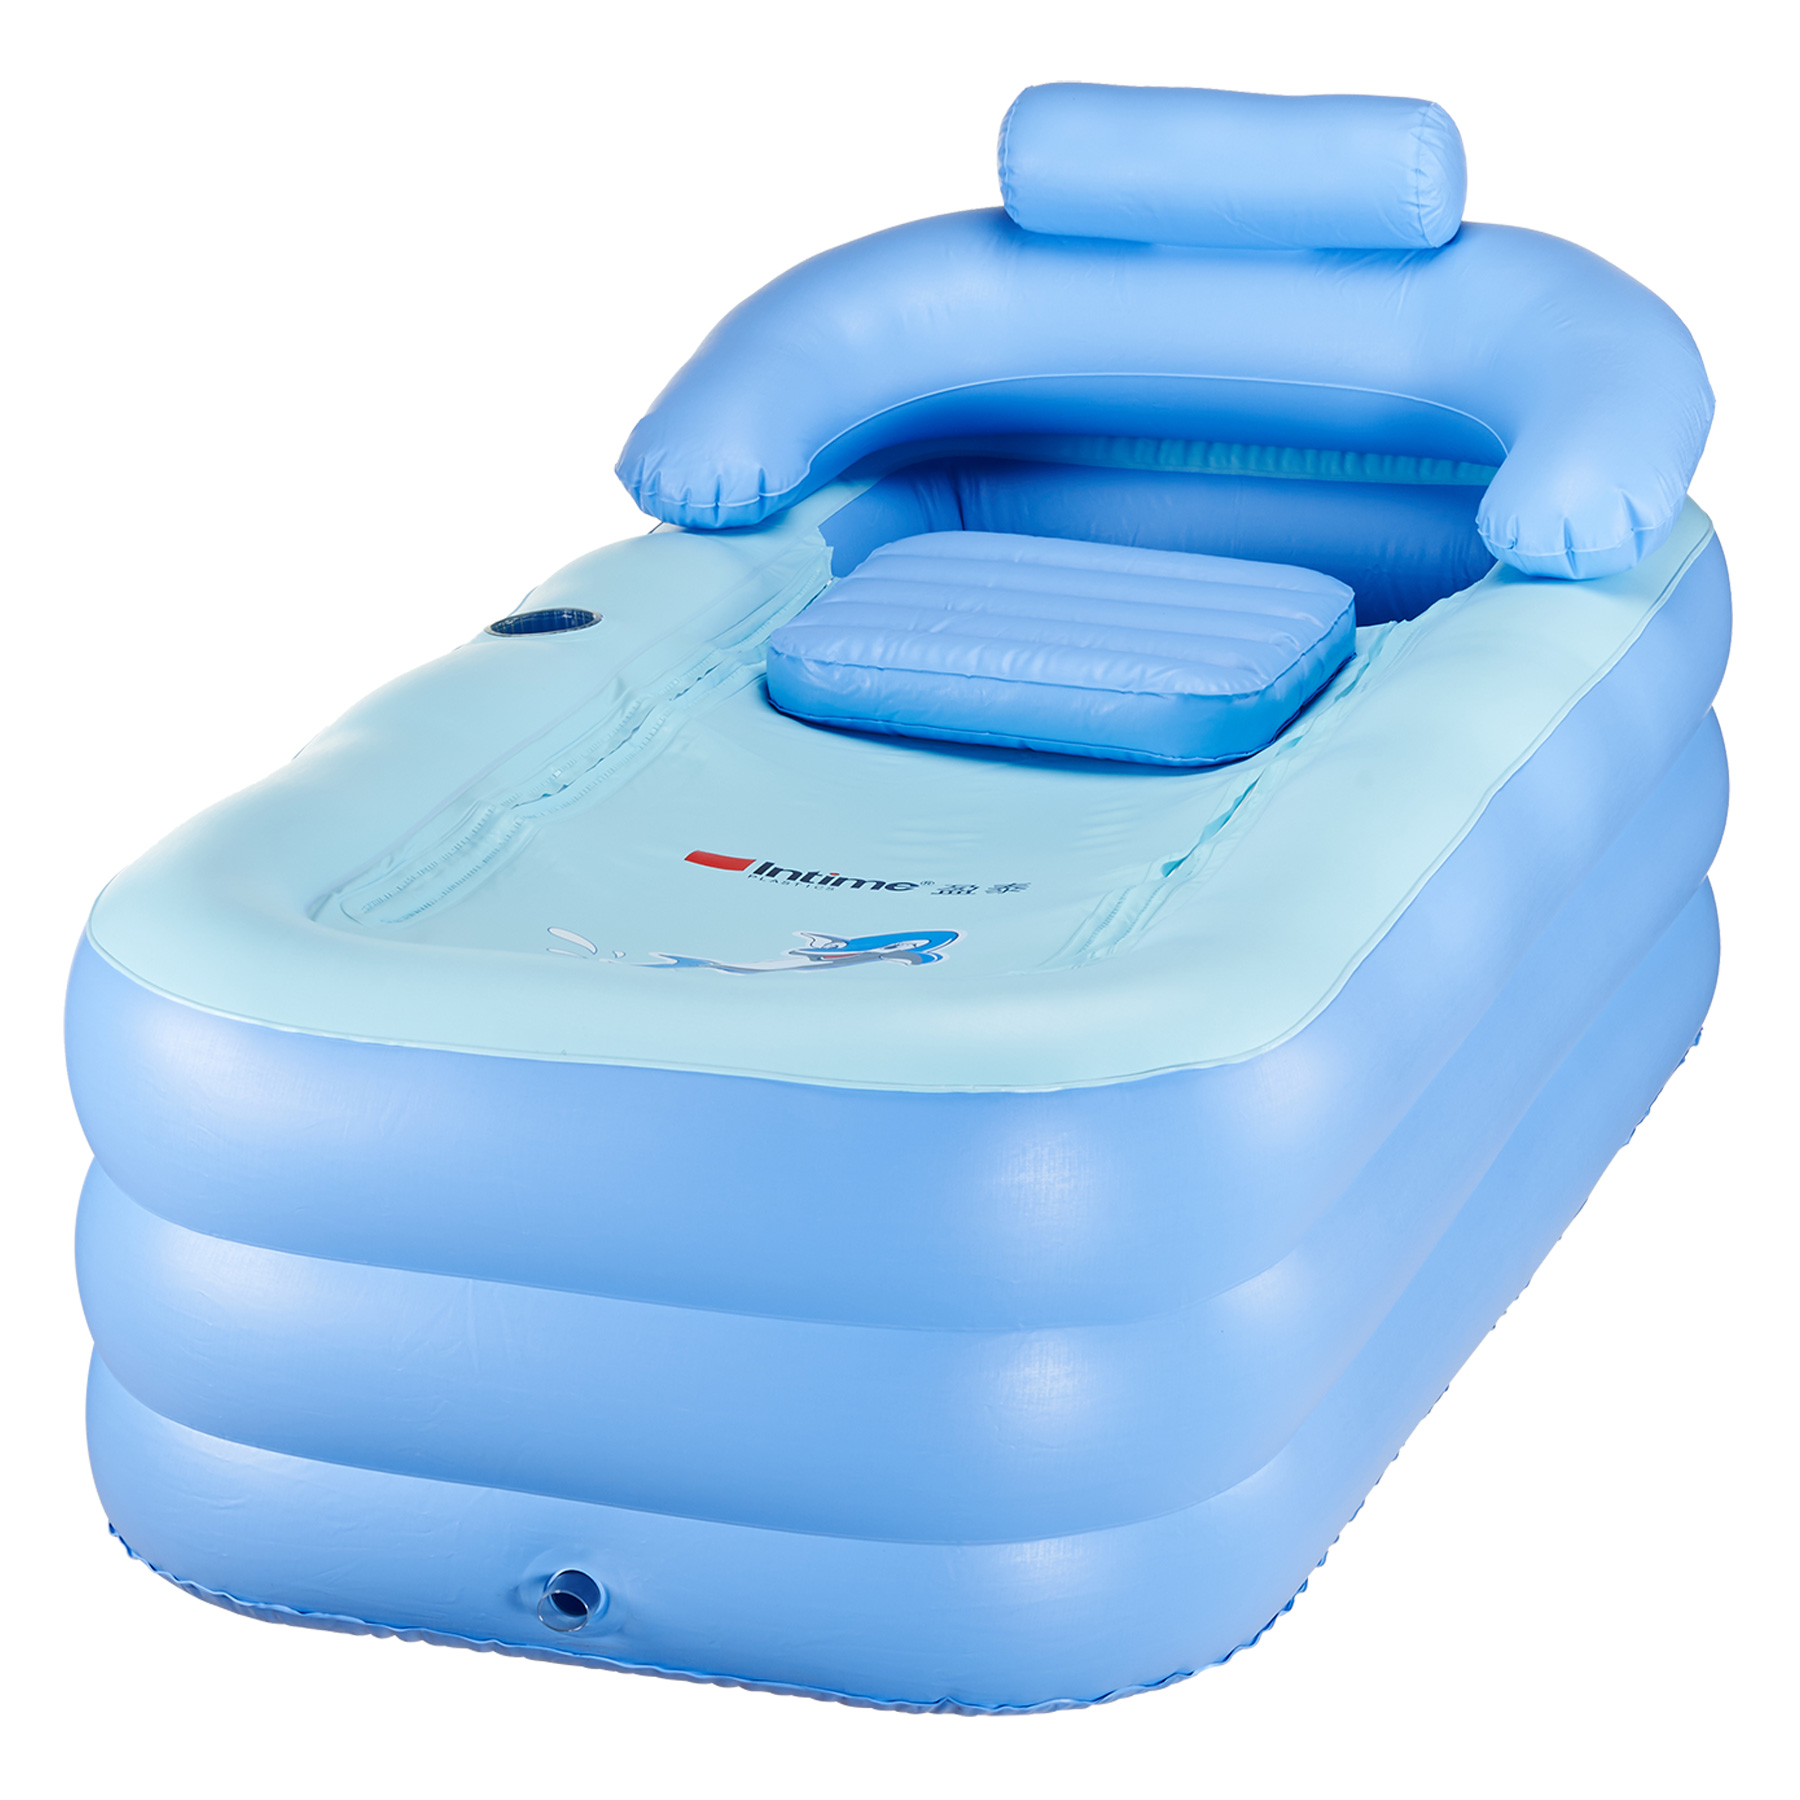 CO-Z PVC Inflatable Spa Bathtub Kit Adult Size by CO-Z